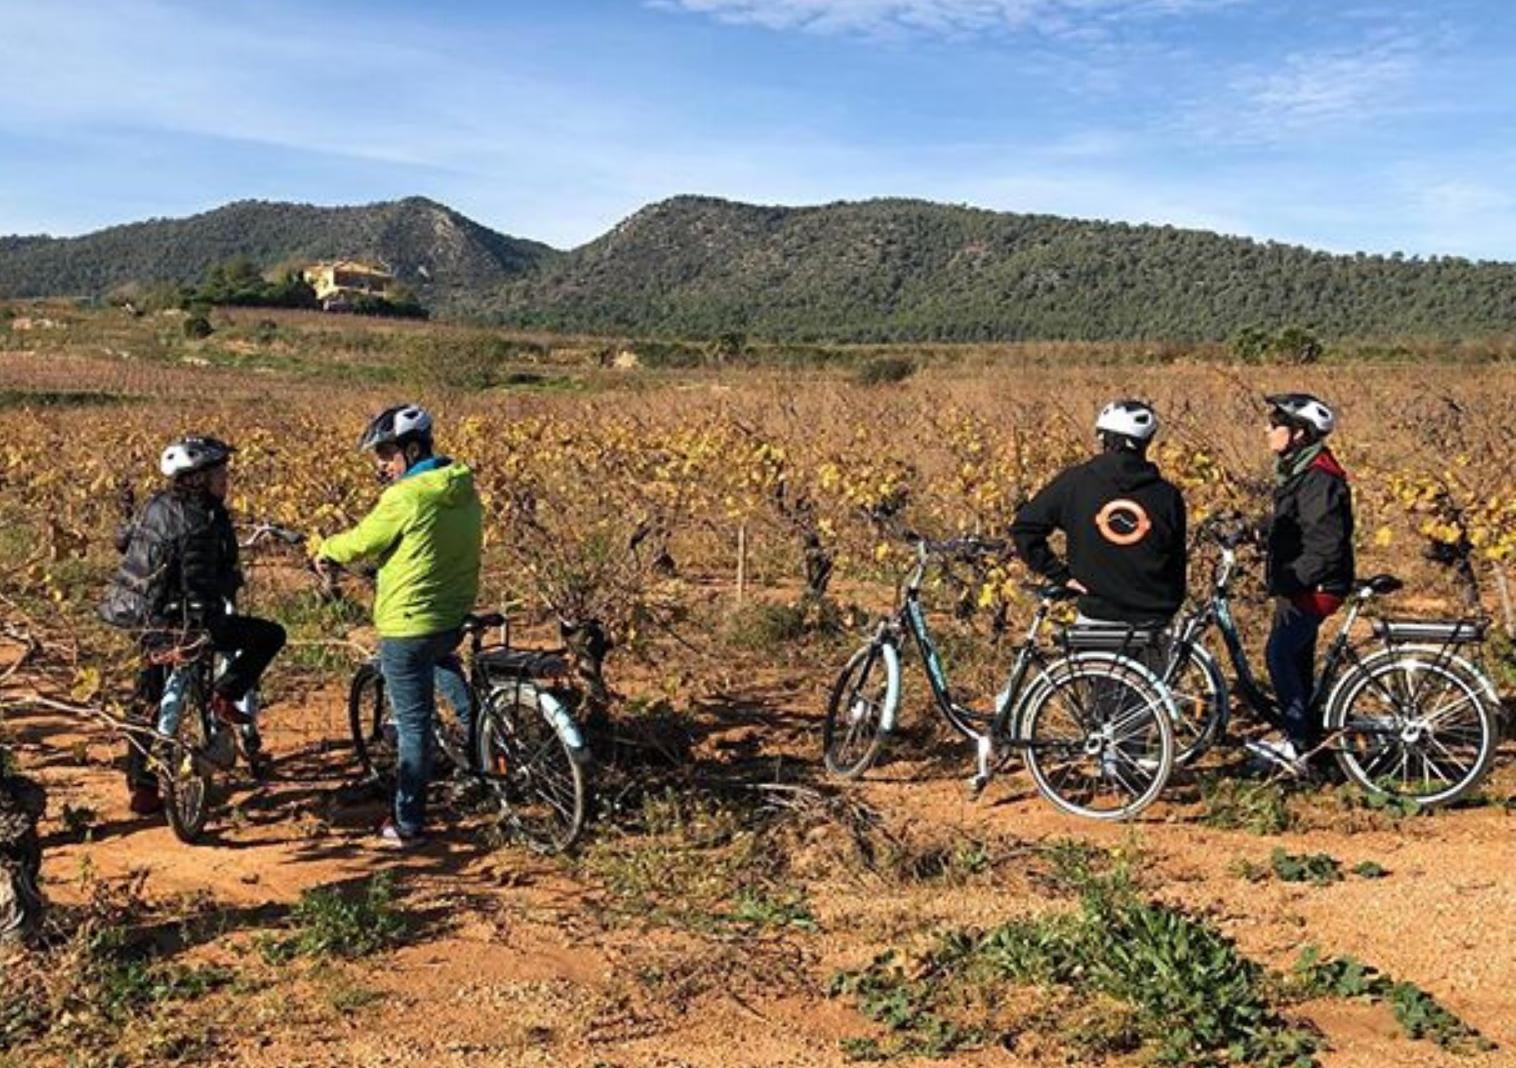 Visita celler del Baix Penedès en bicicleta o Ebike (3h)